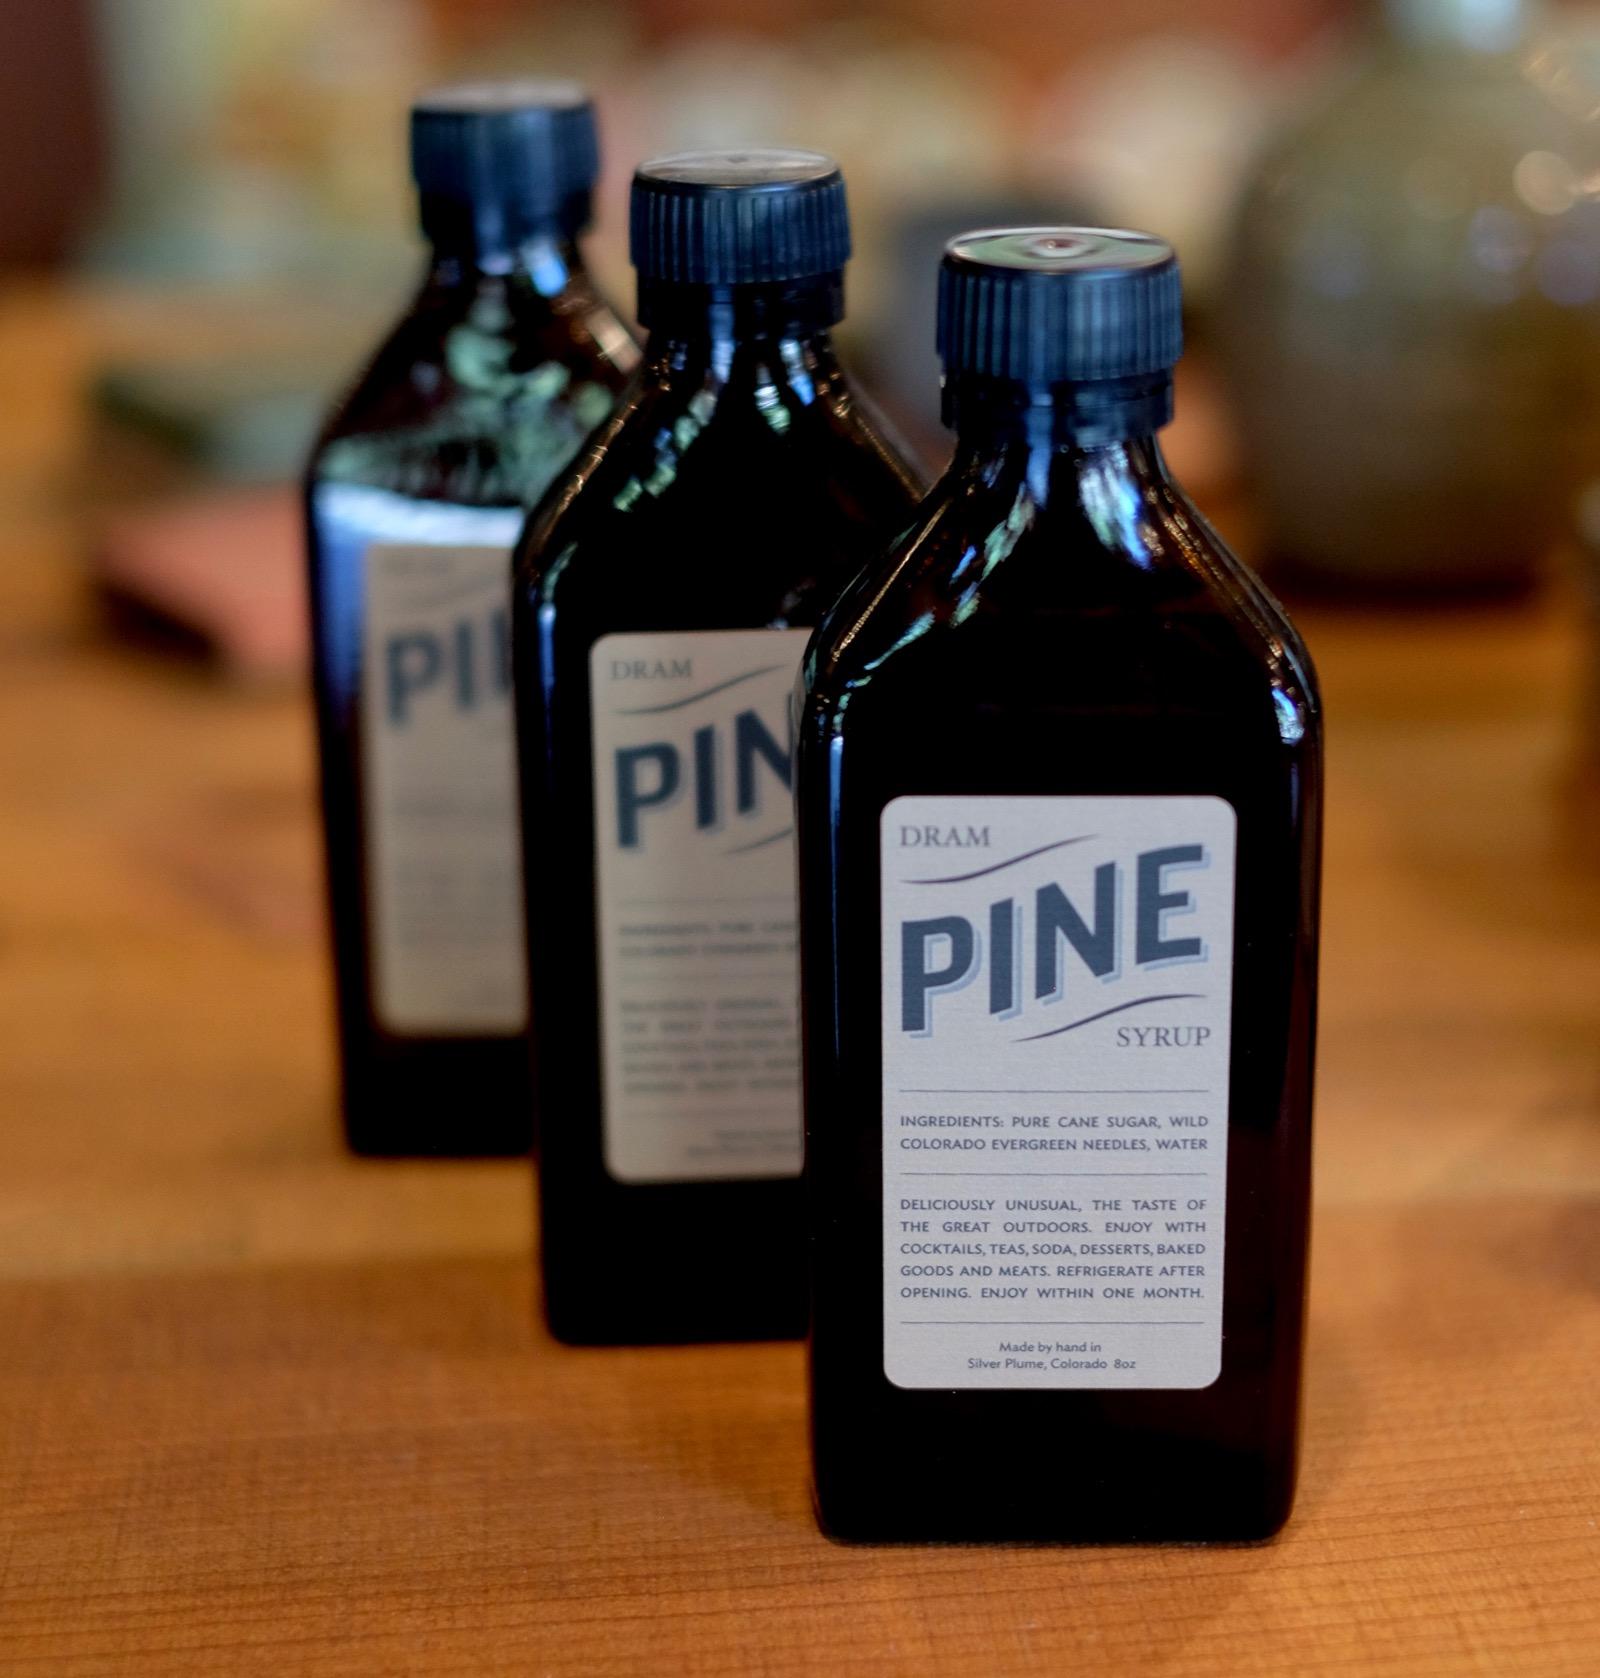 JonesAndCompany-Dram-Pine-Syrup.jpg